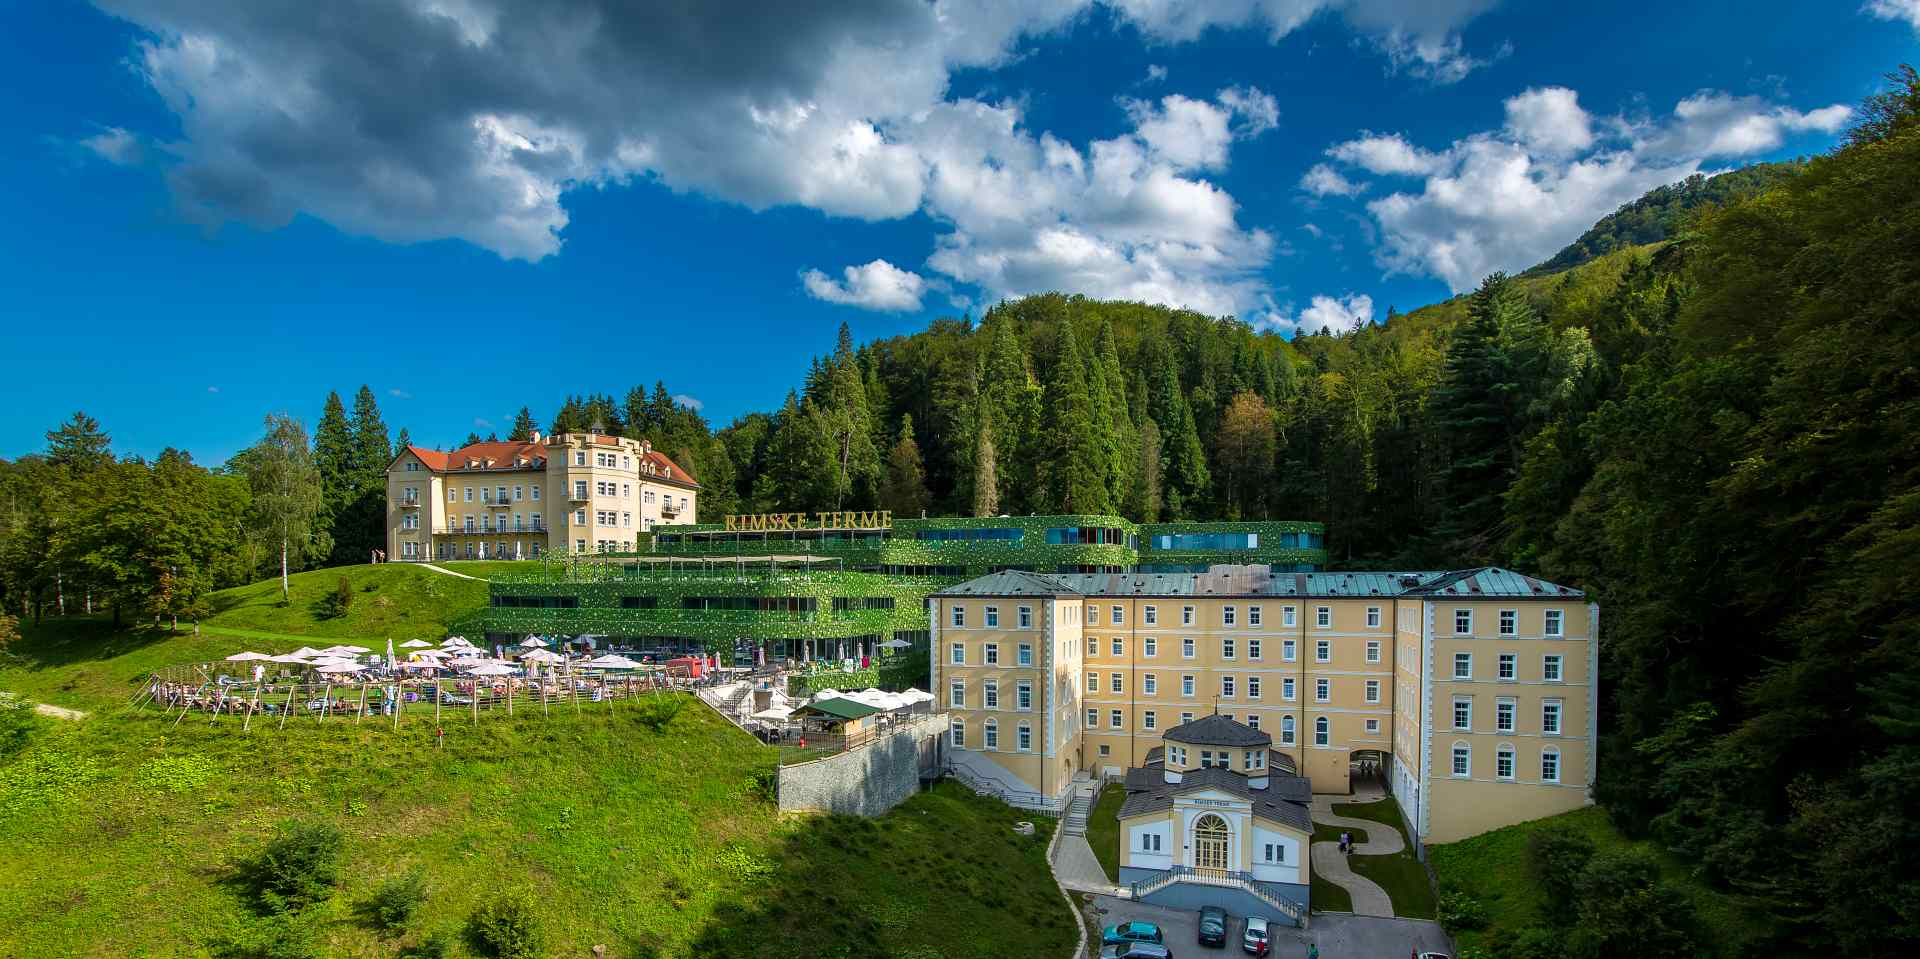 PASQUA IN RELAX ALLE TERME IN SLOVENIA